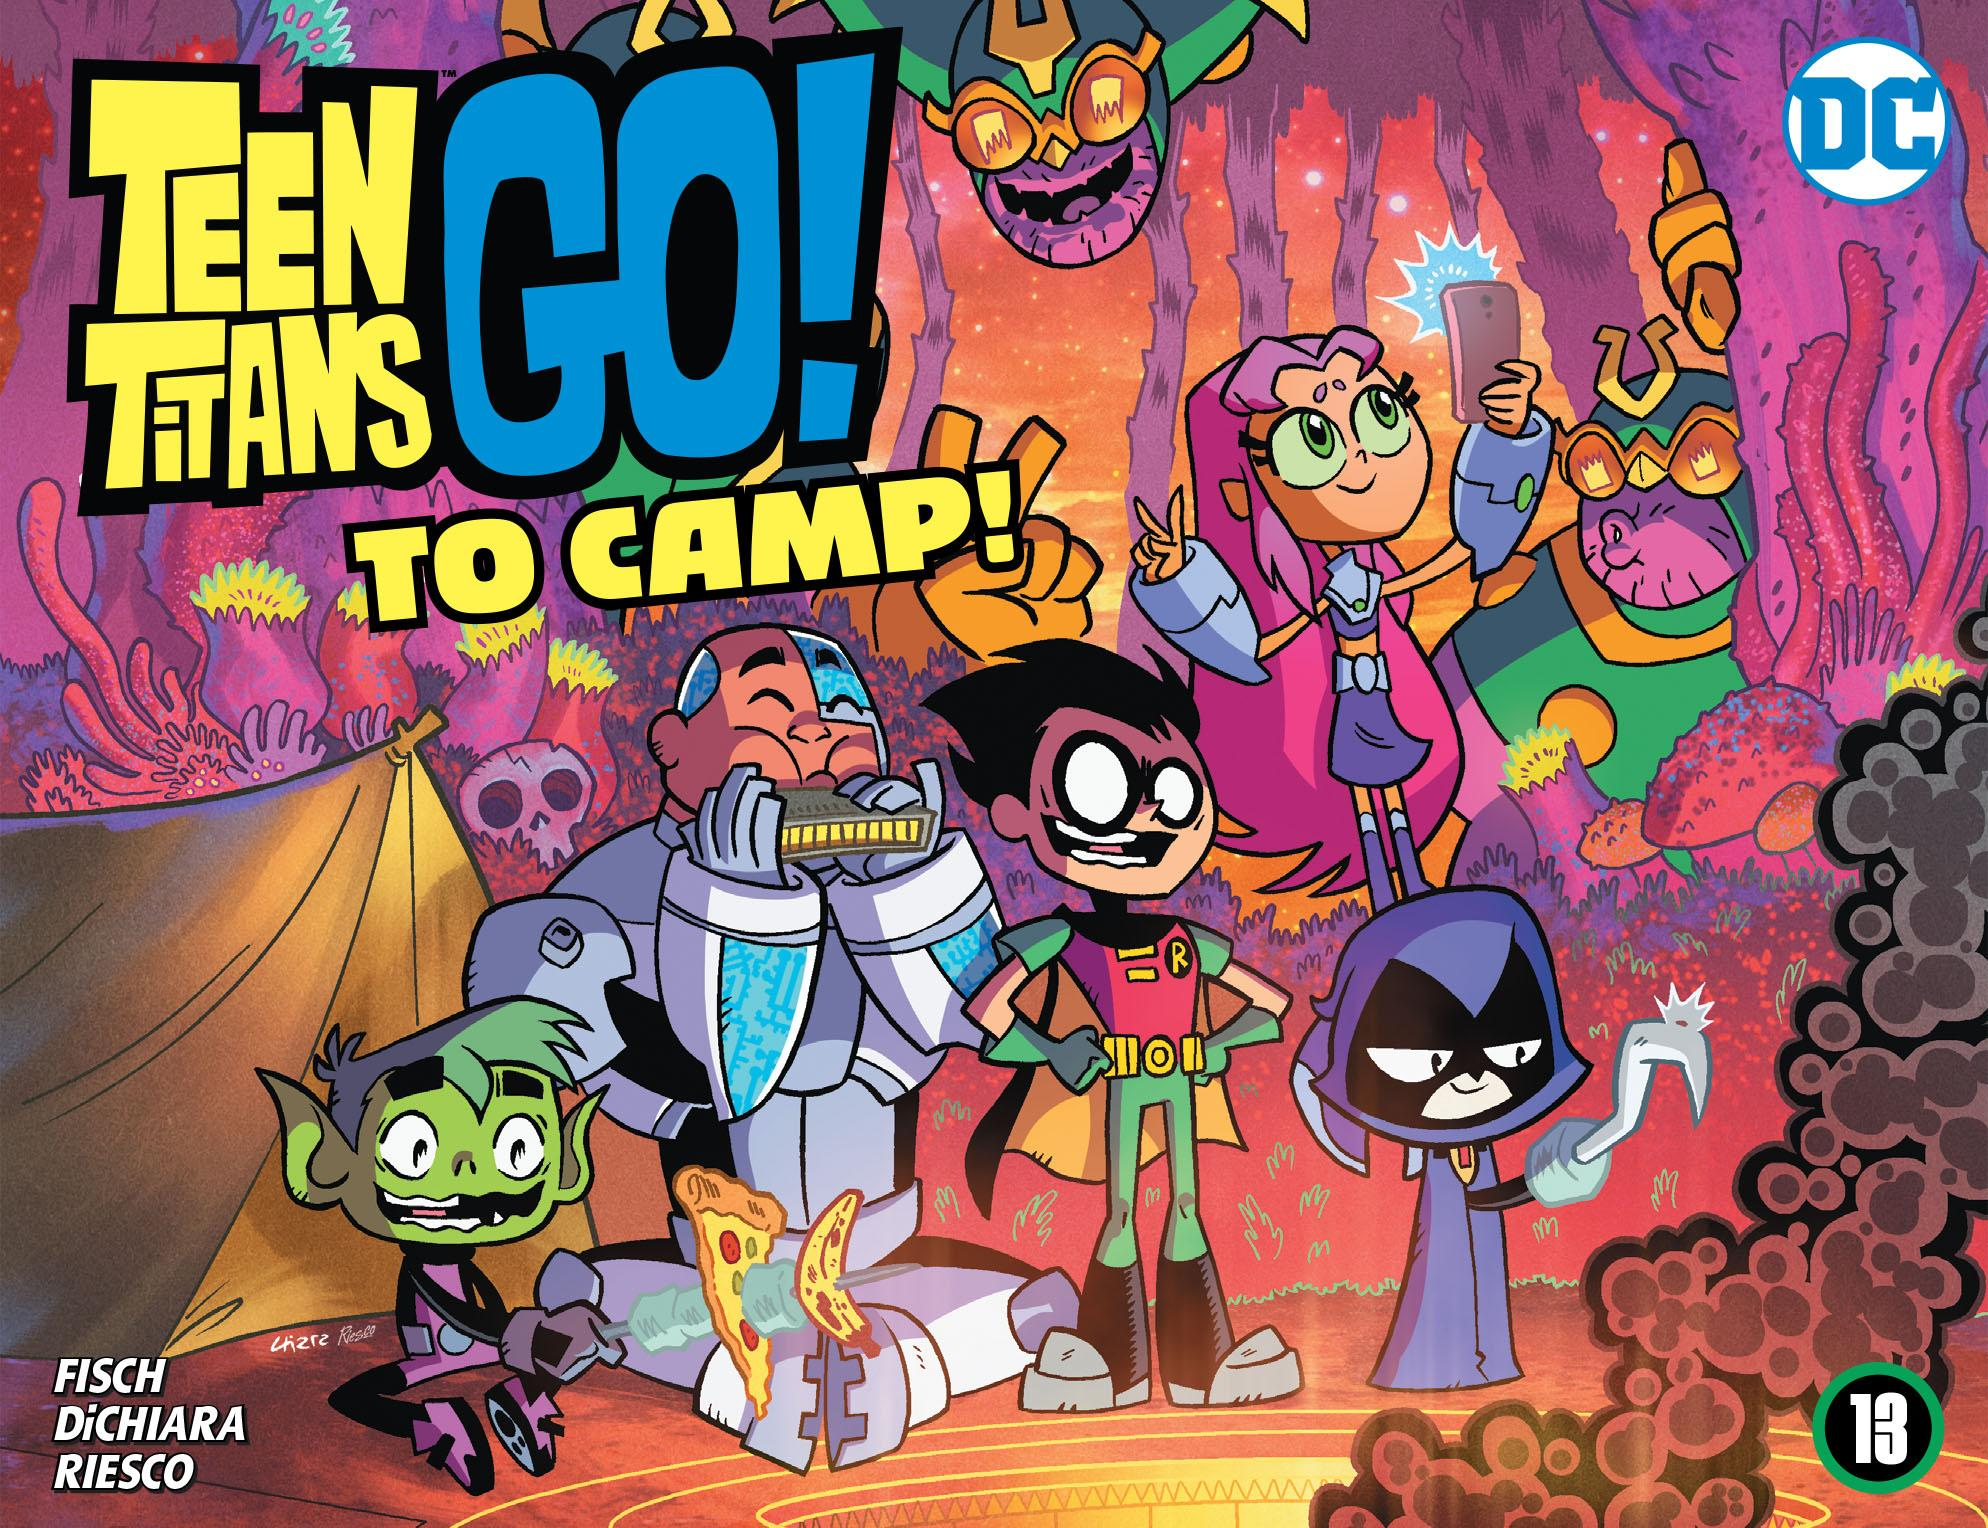 Teen Titans Go! To Camp 013 2020 digital Son of Ultron